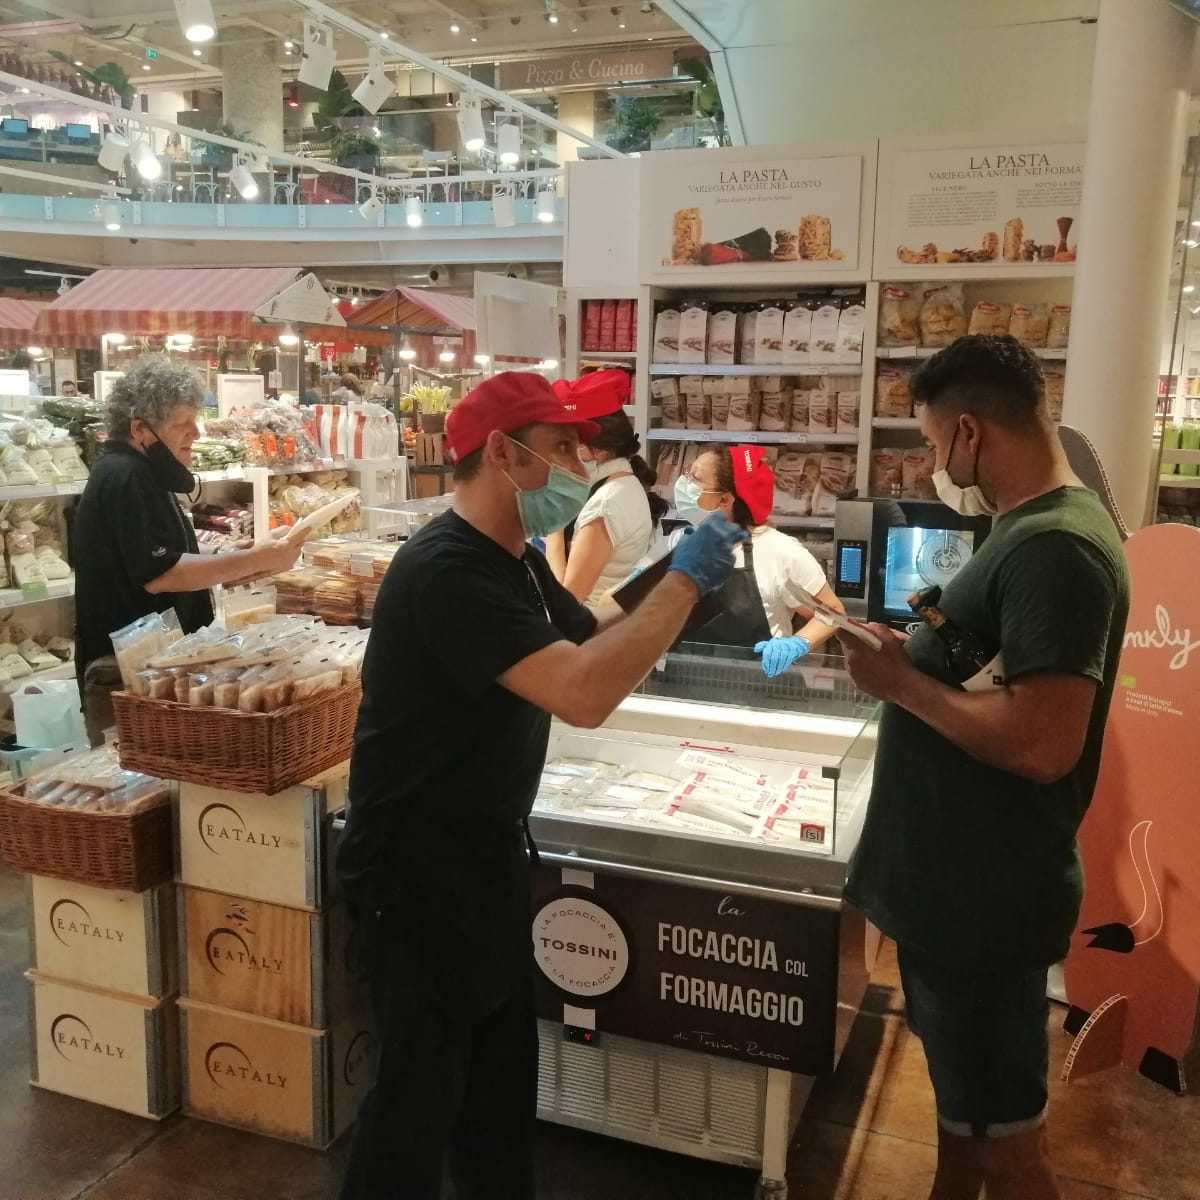 Corner Tossini -Eataly Store Milano Smeraldo (24)